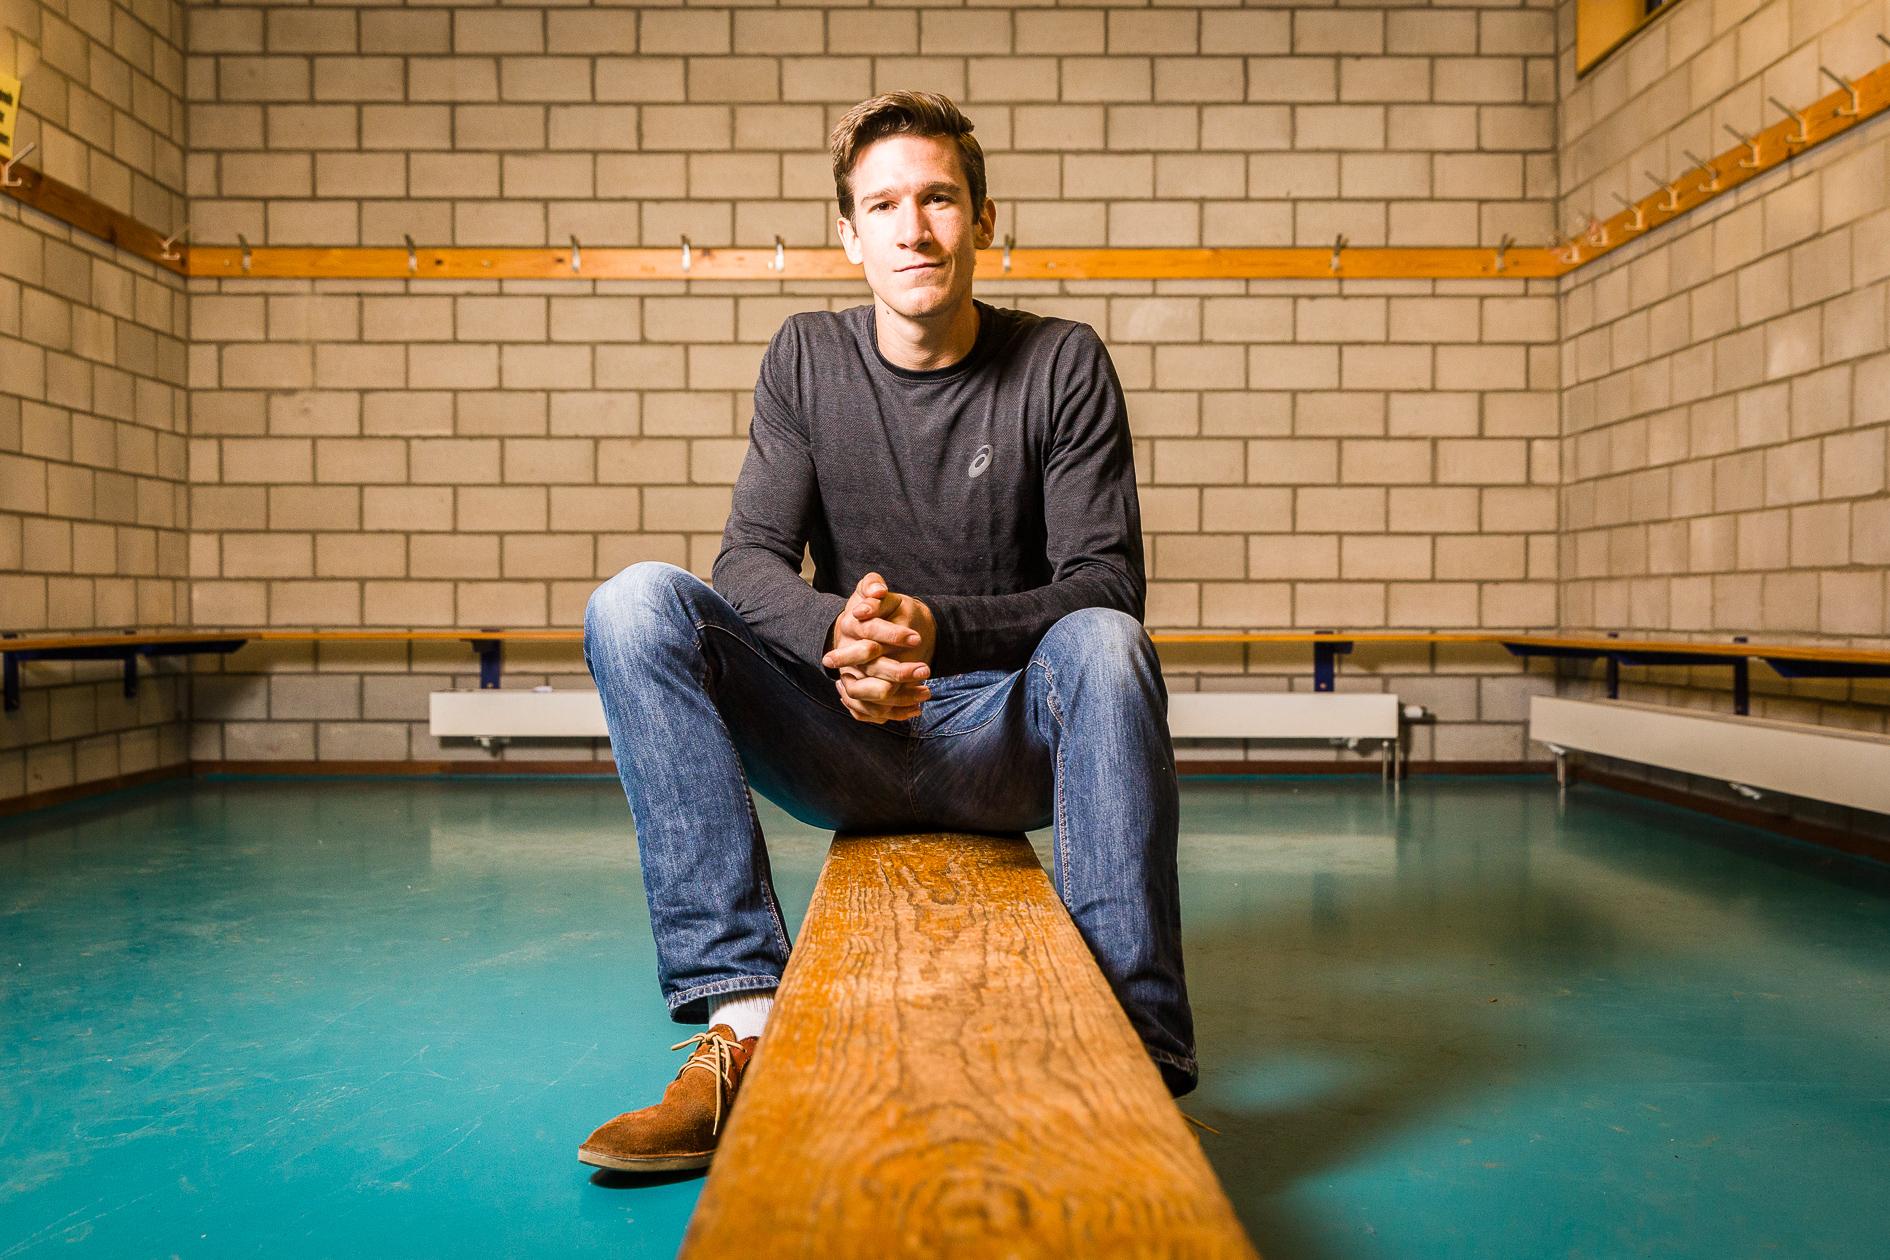 Thomas Van der Plaetsen